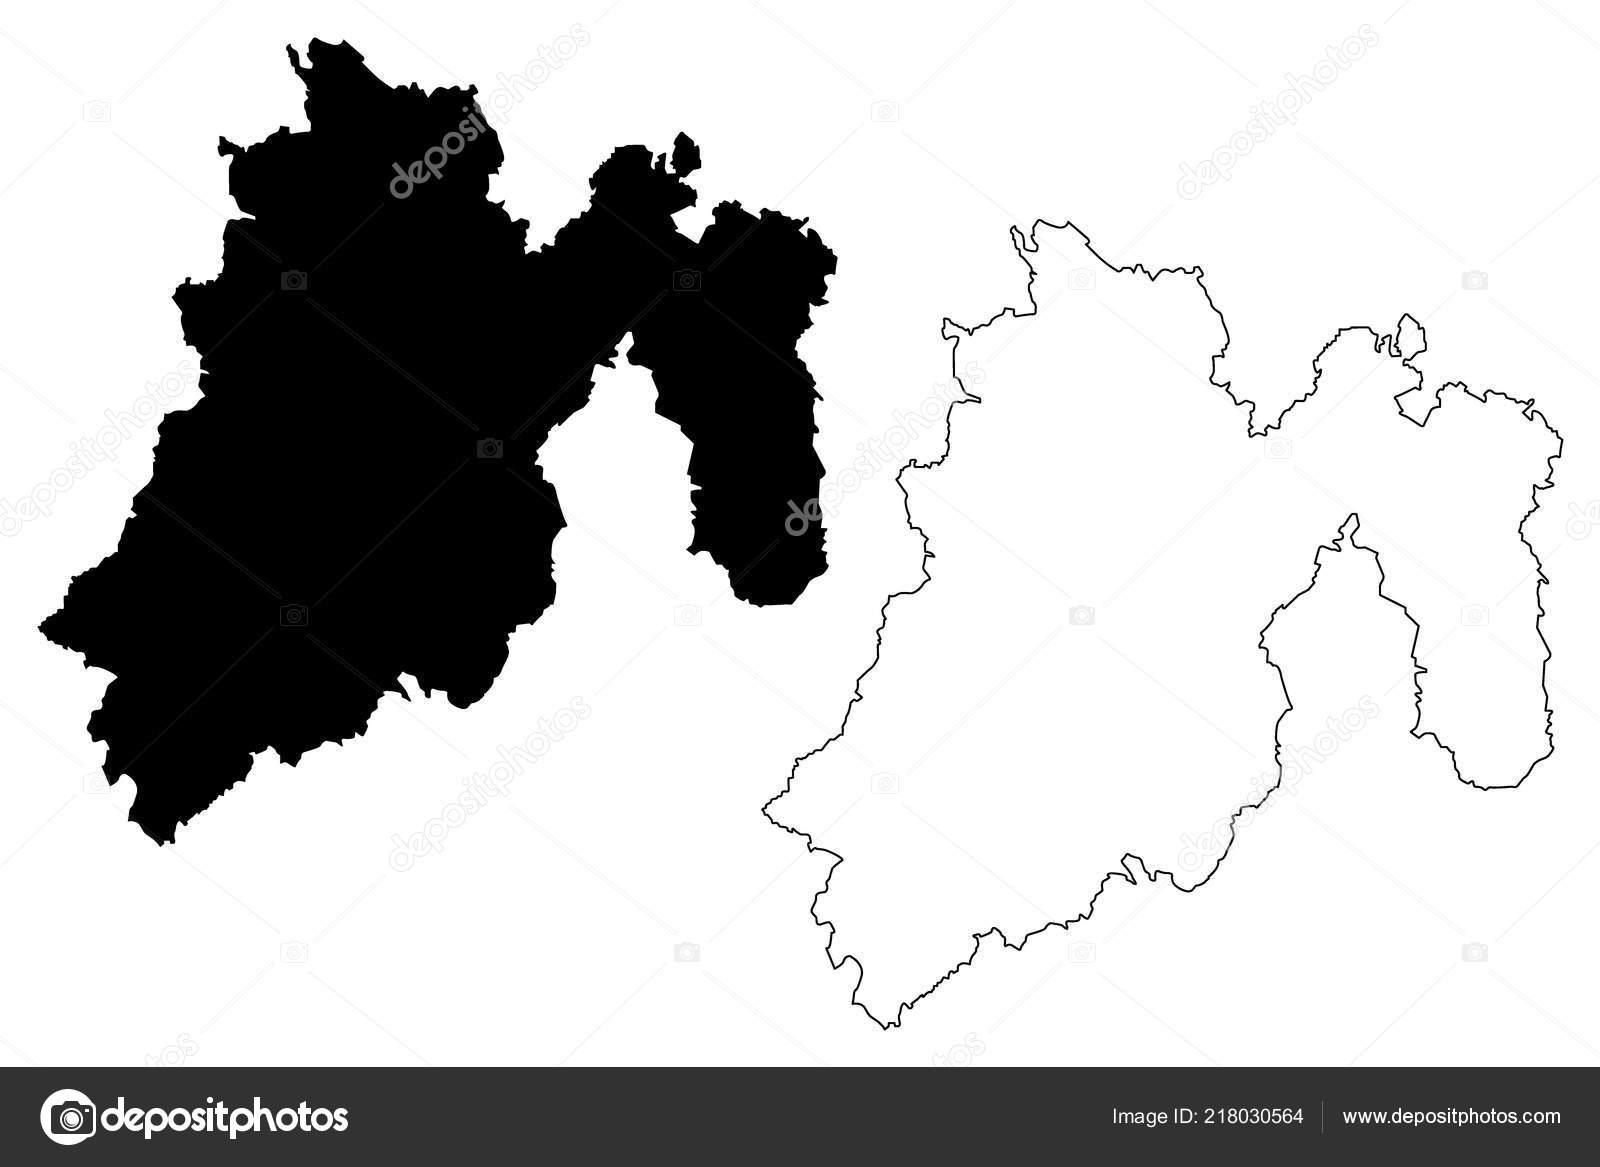 Mexiko Staaten Karte.Estado Mexico Vereinigten Mexikanischen Staaten Mexiko